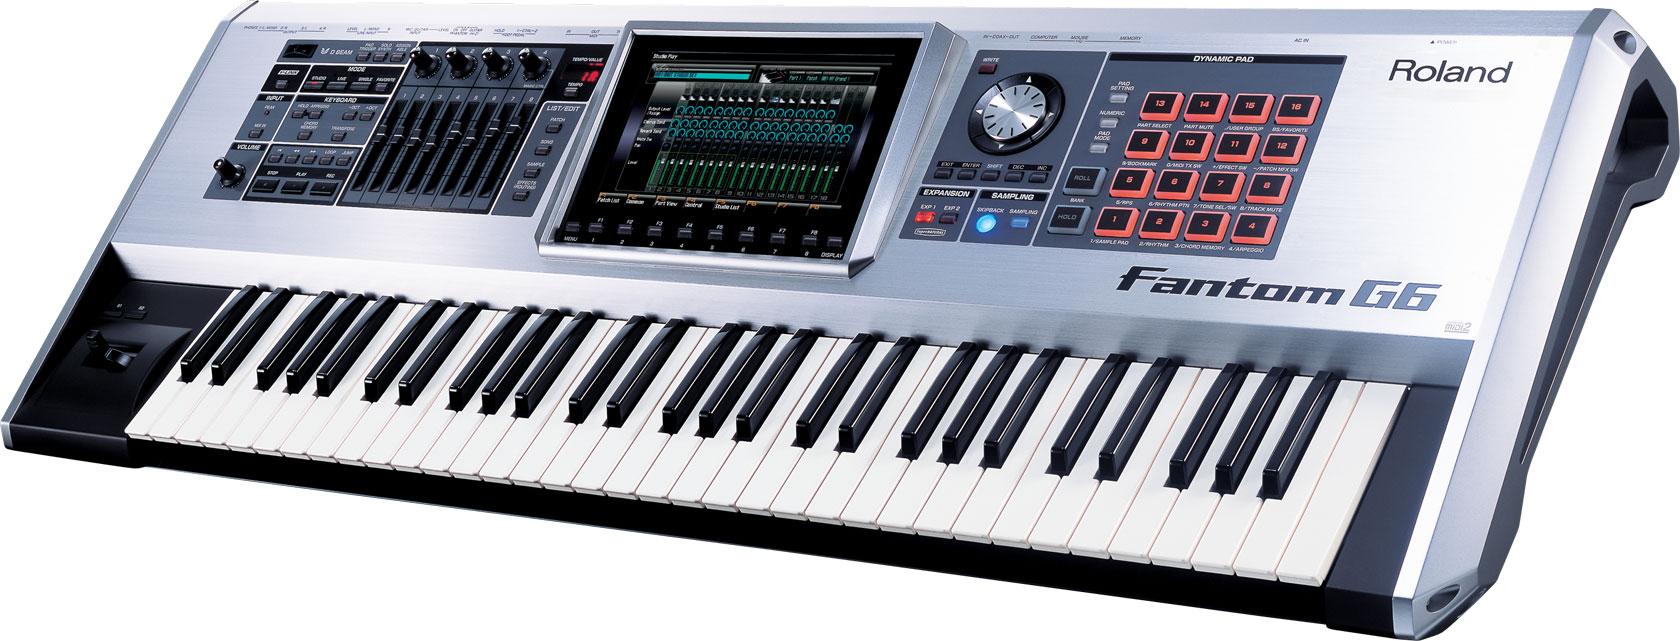 Roland Fantom G6 Music Workstation